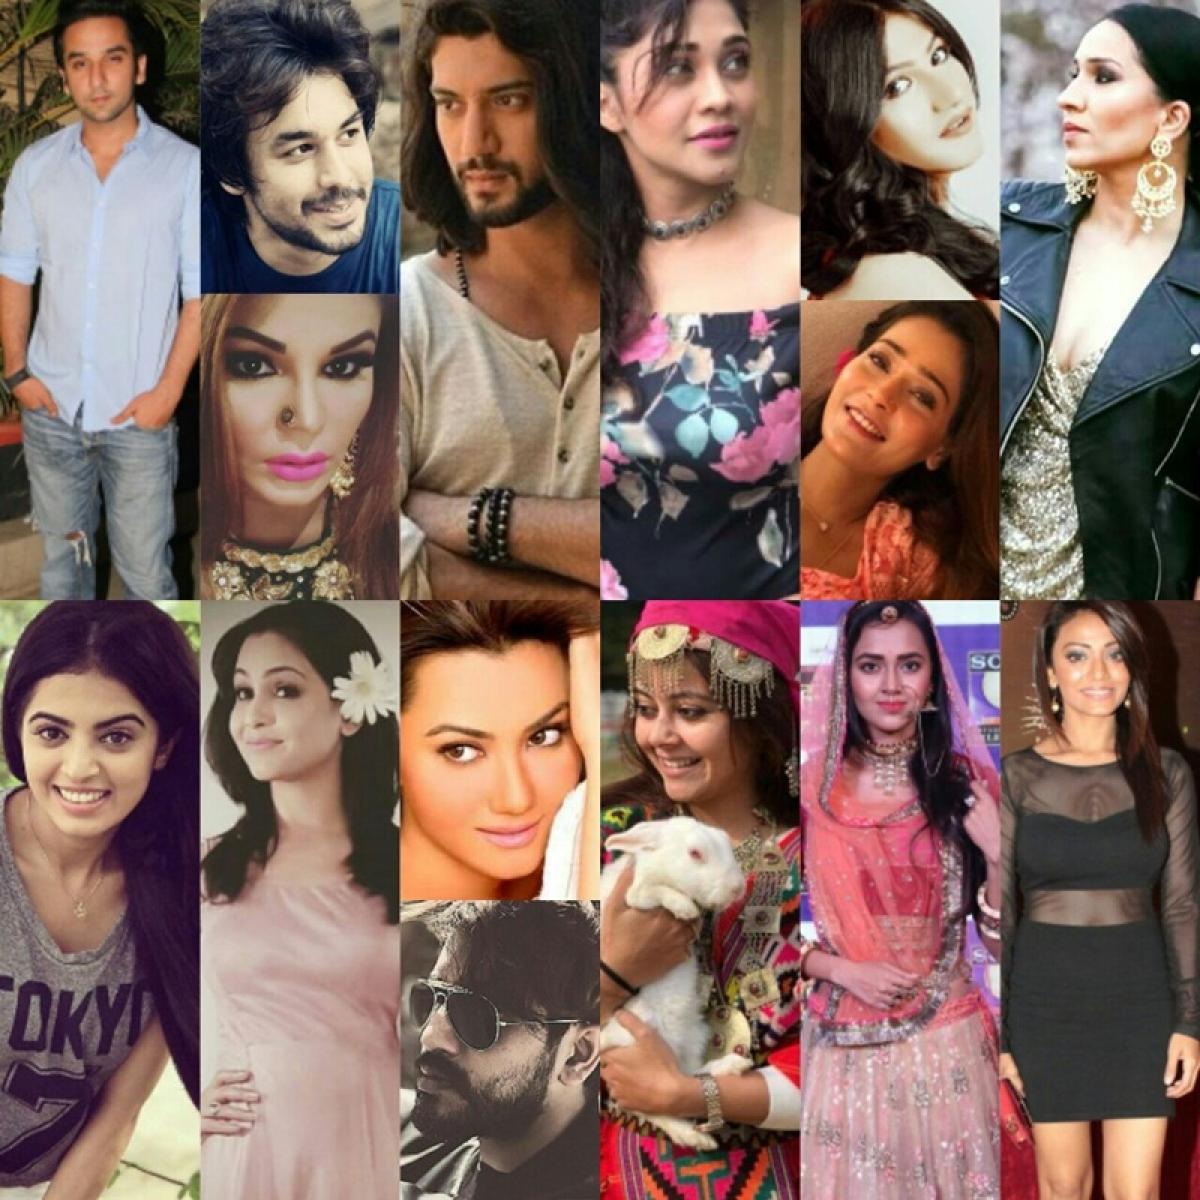 Sara Khan, Devoleena, Amrapali: TV star pays tribute to Netaji Subhash Chandra Bose